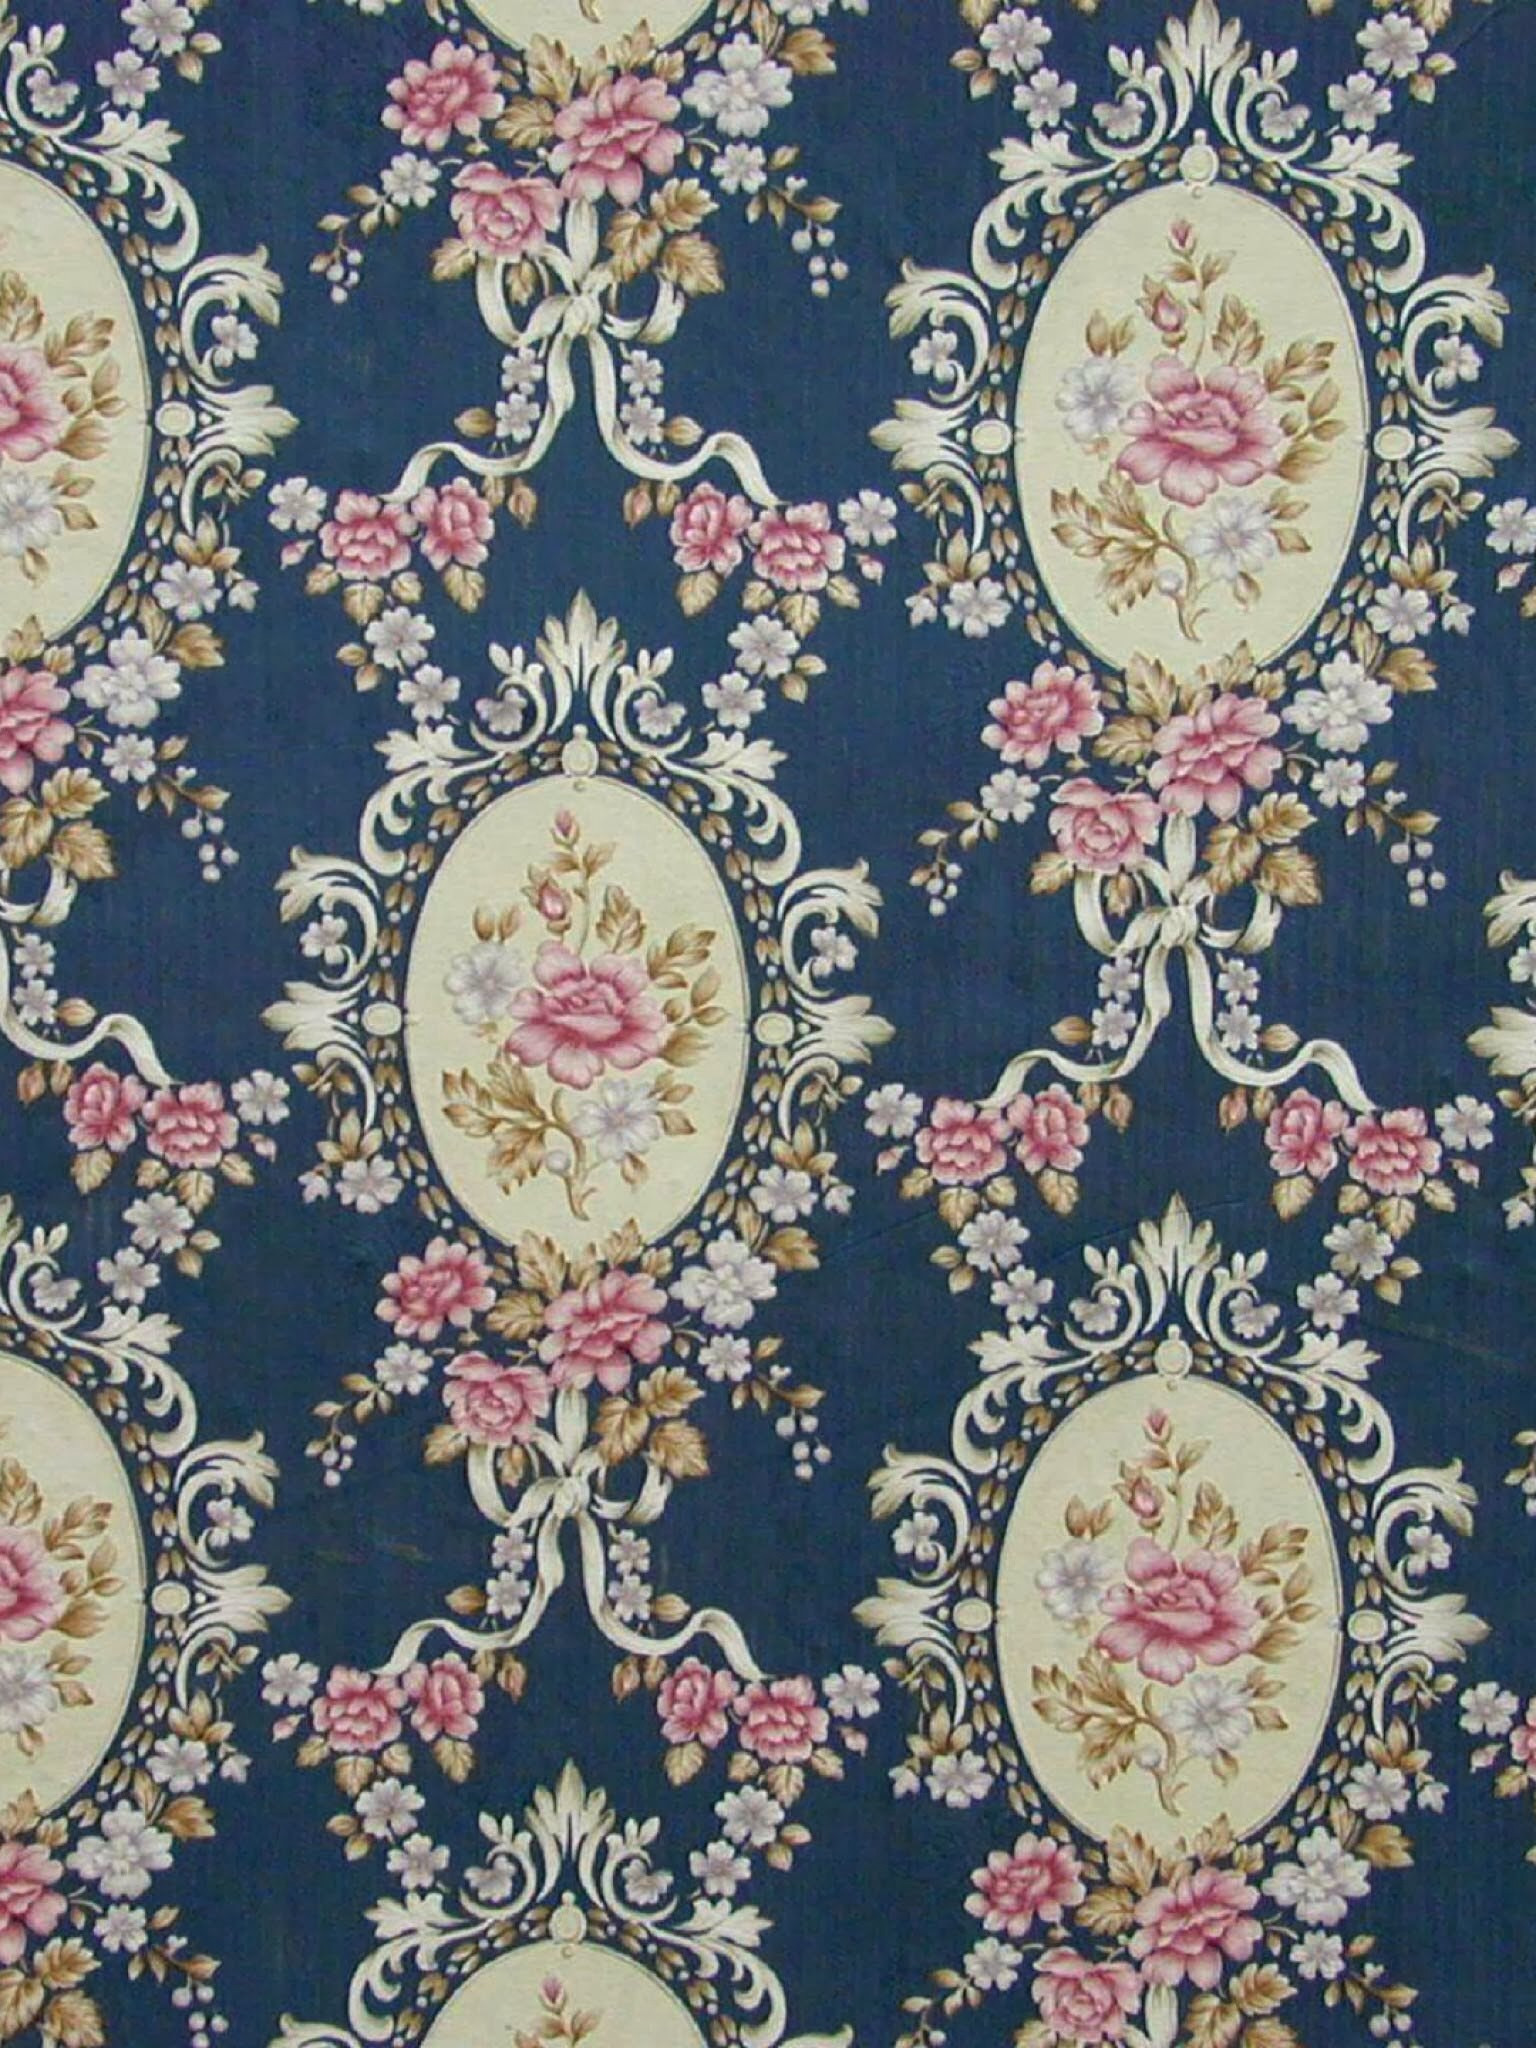 Polka Dot Wallpaper Iphone Pretty Vintage Backgrounds 183 ① Wallpapertag